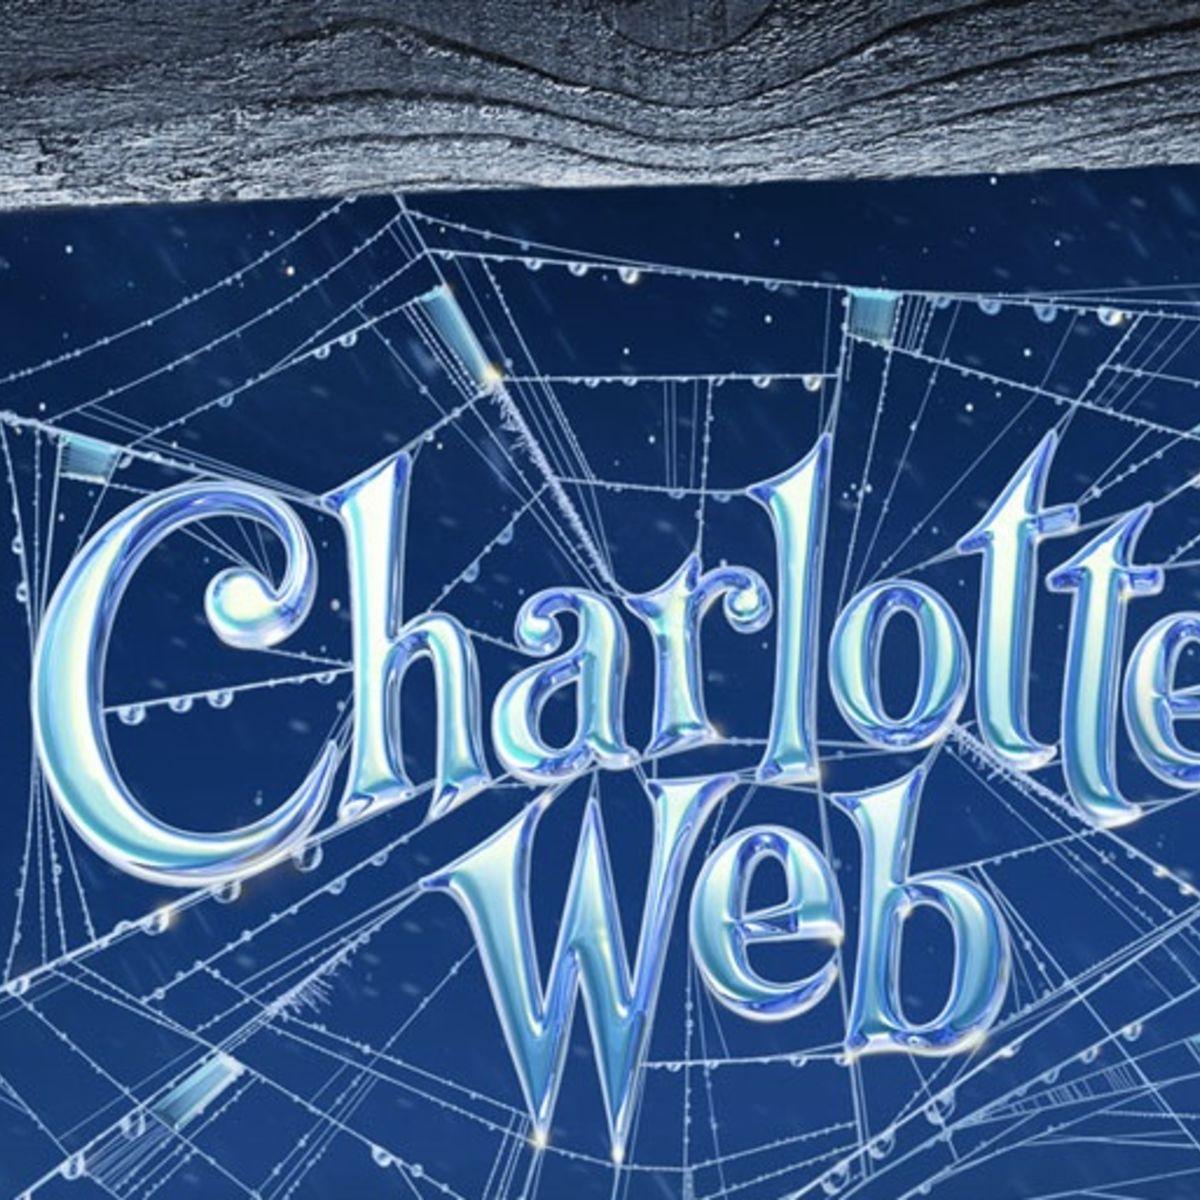 Charlottes_Web_0.jpg